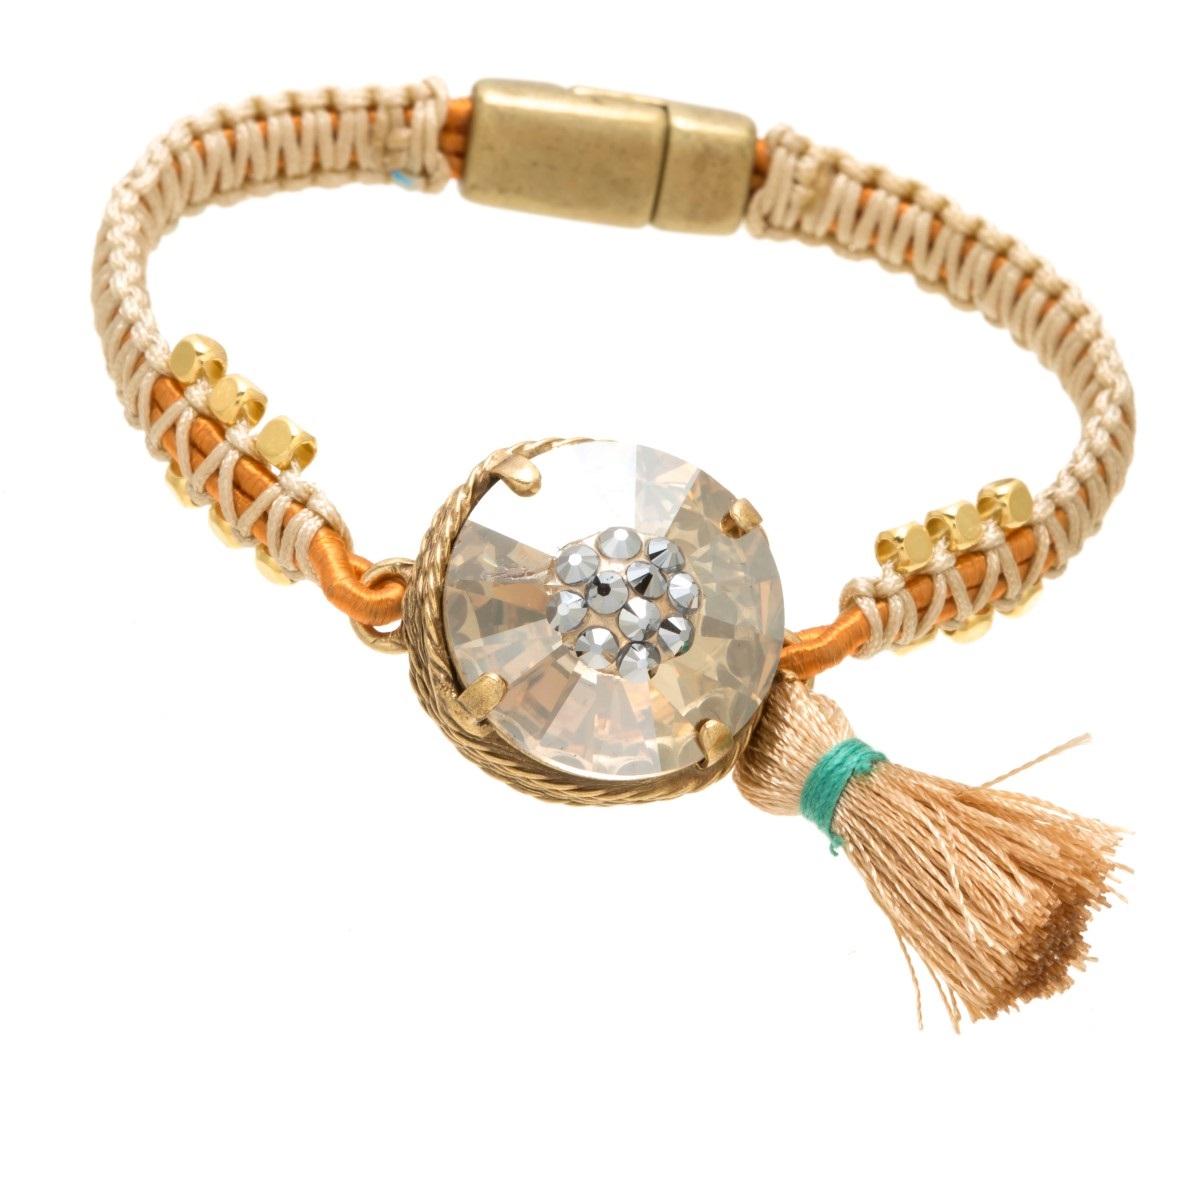 ARTWEAR DIMITRIADIS - Γυναικείο βραχιόλι ARTWEAR DIMITRIADIS με κορδόνι και στρα γυναικεία αξεσουάρ κοσμήματα βραχιόλια